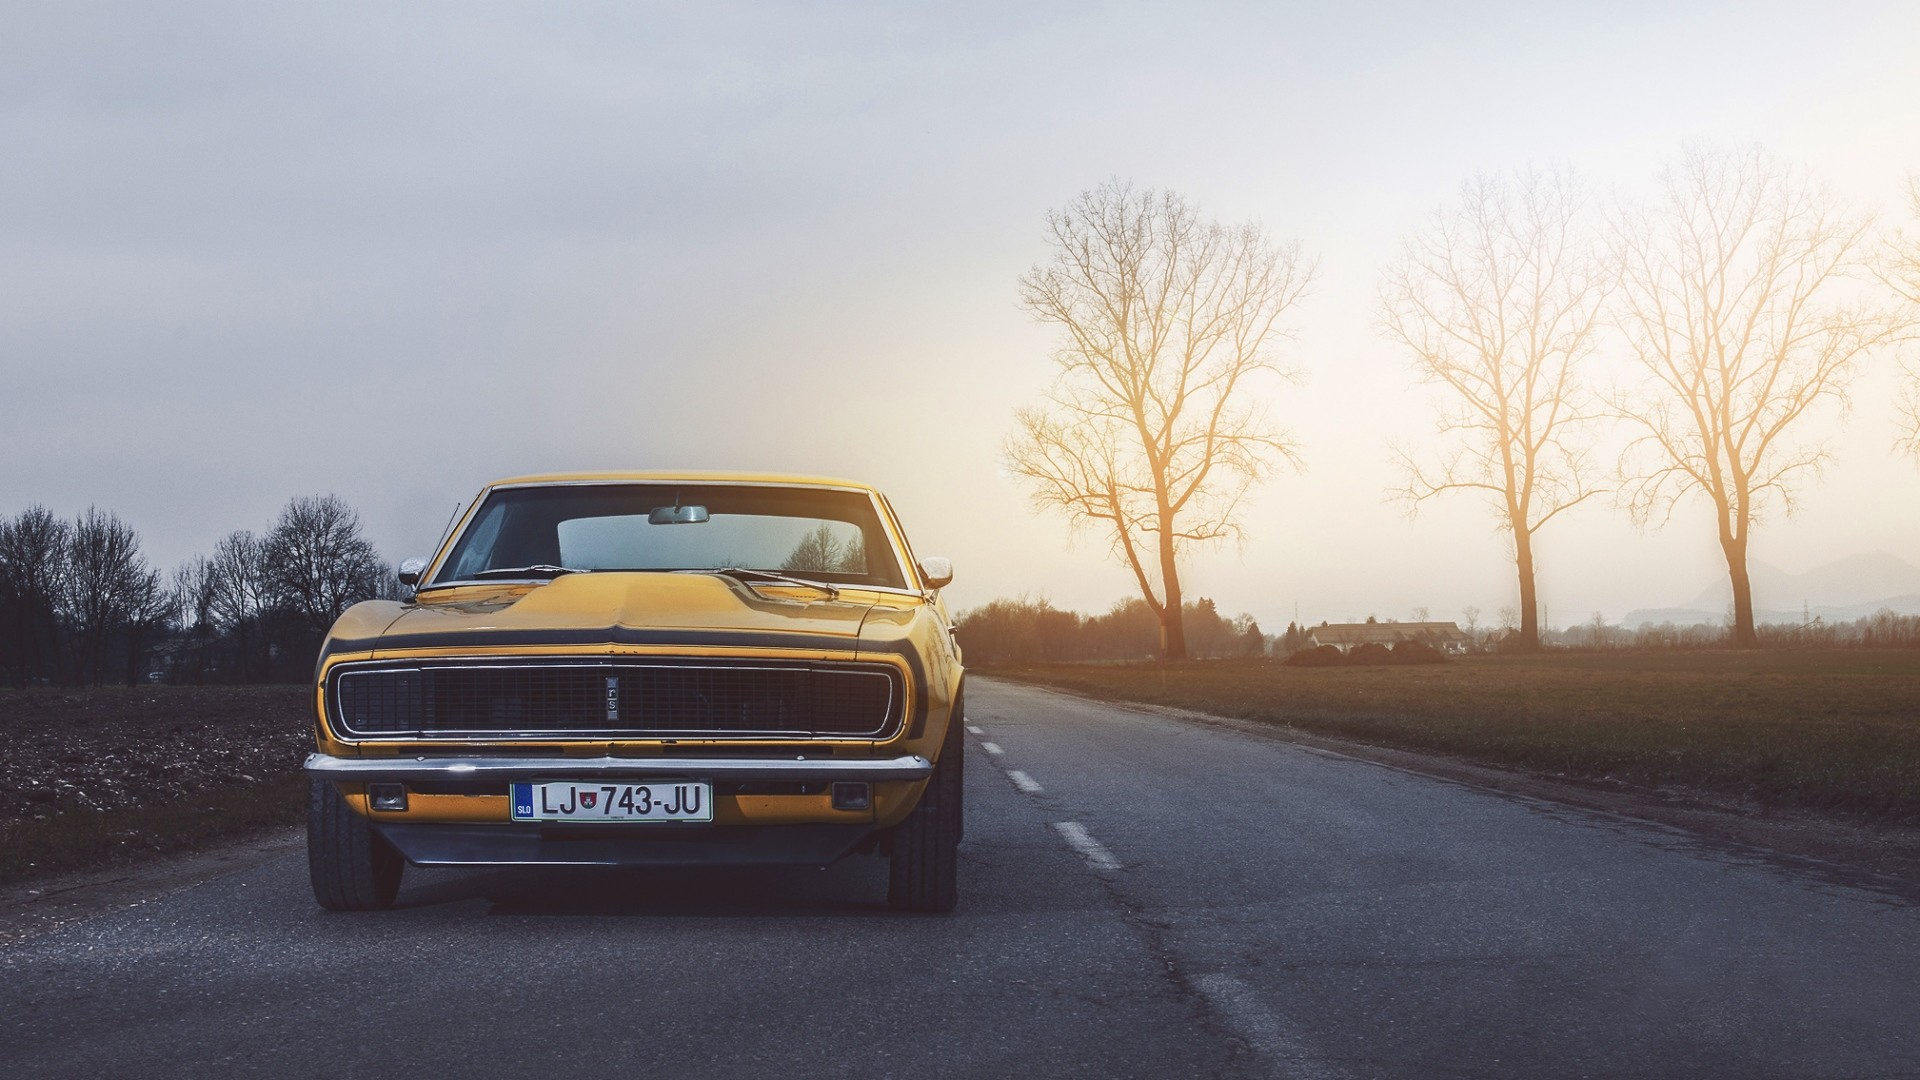 69 Camaro Ss Wallpaper 56 Images